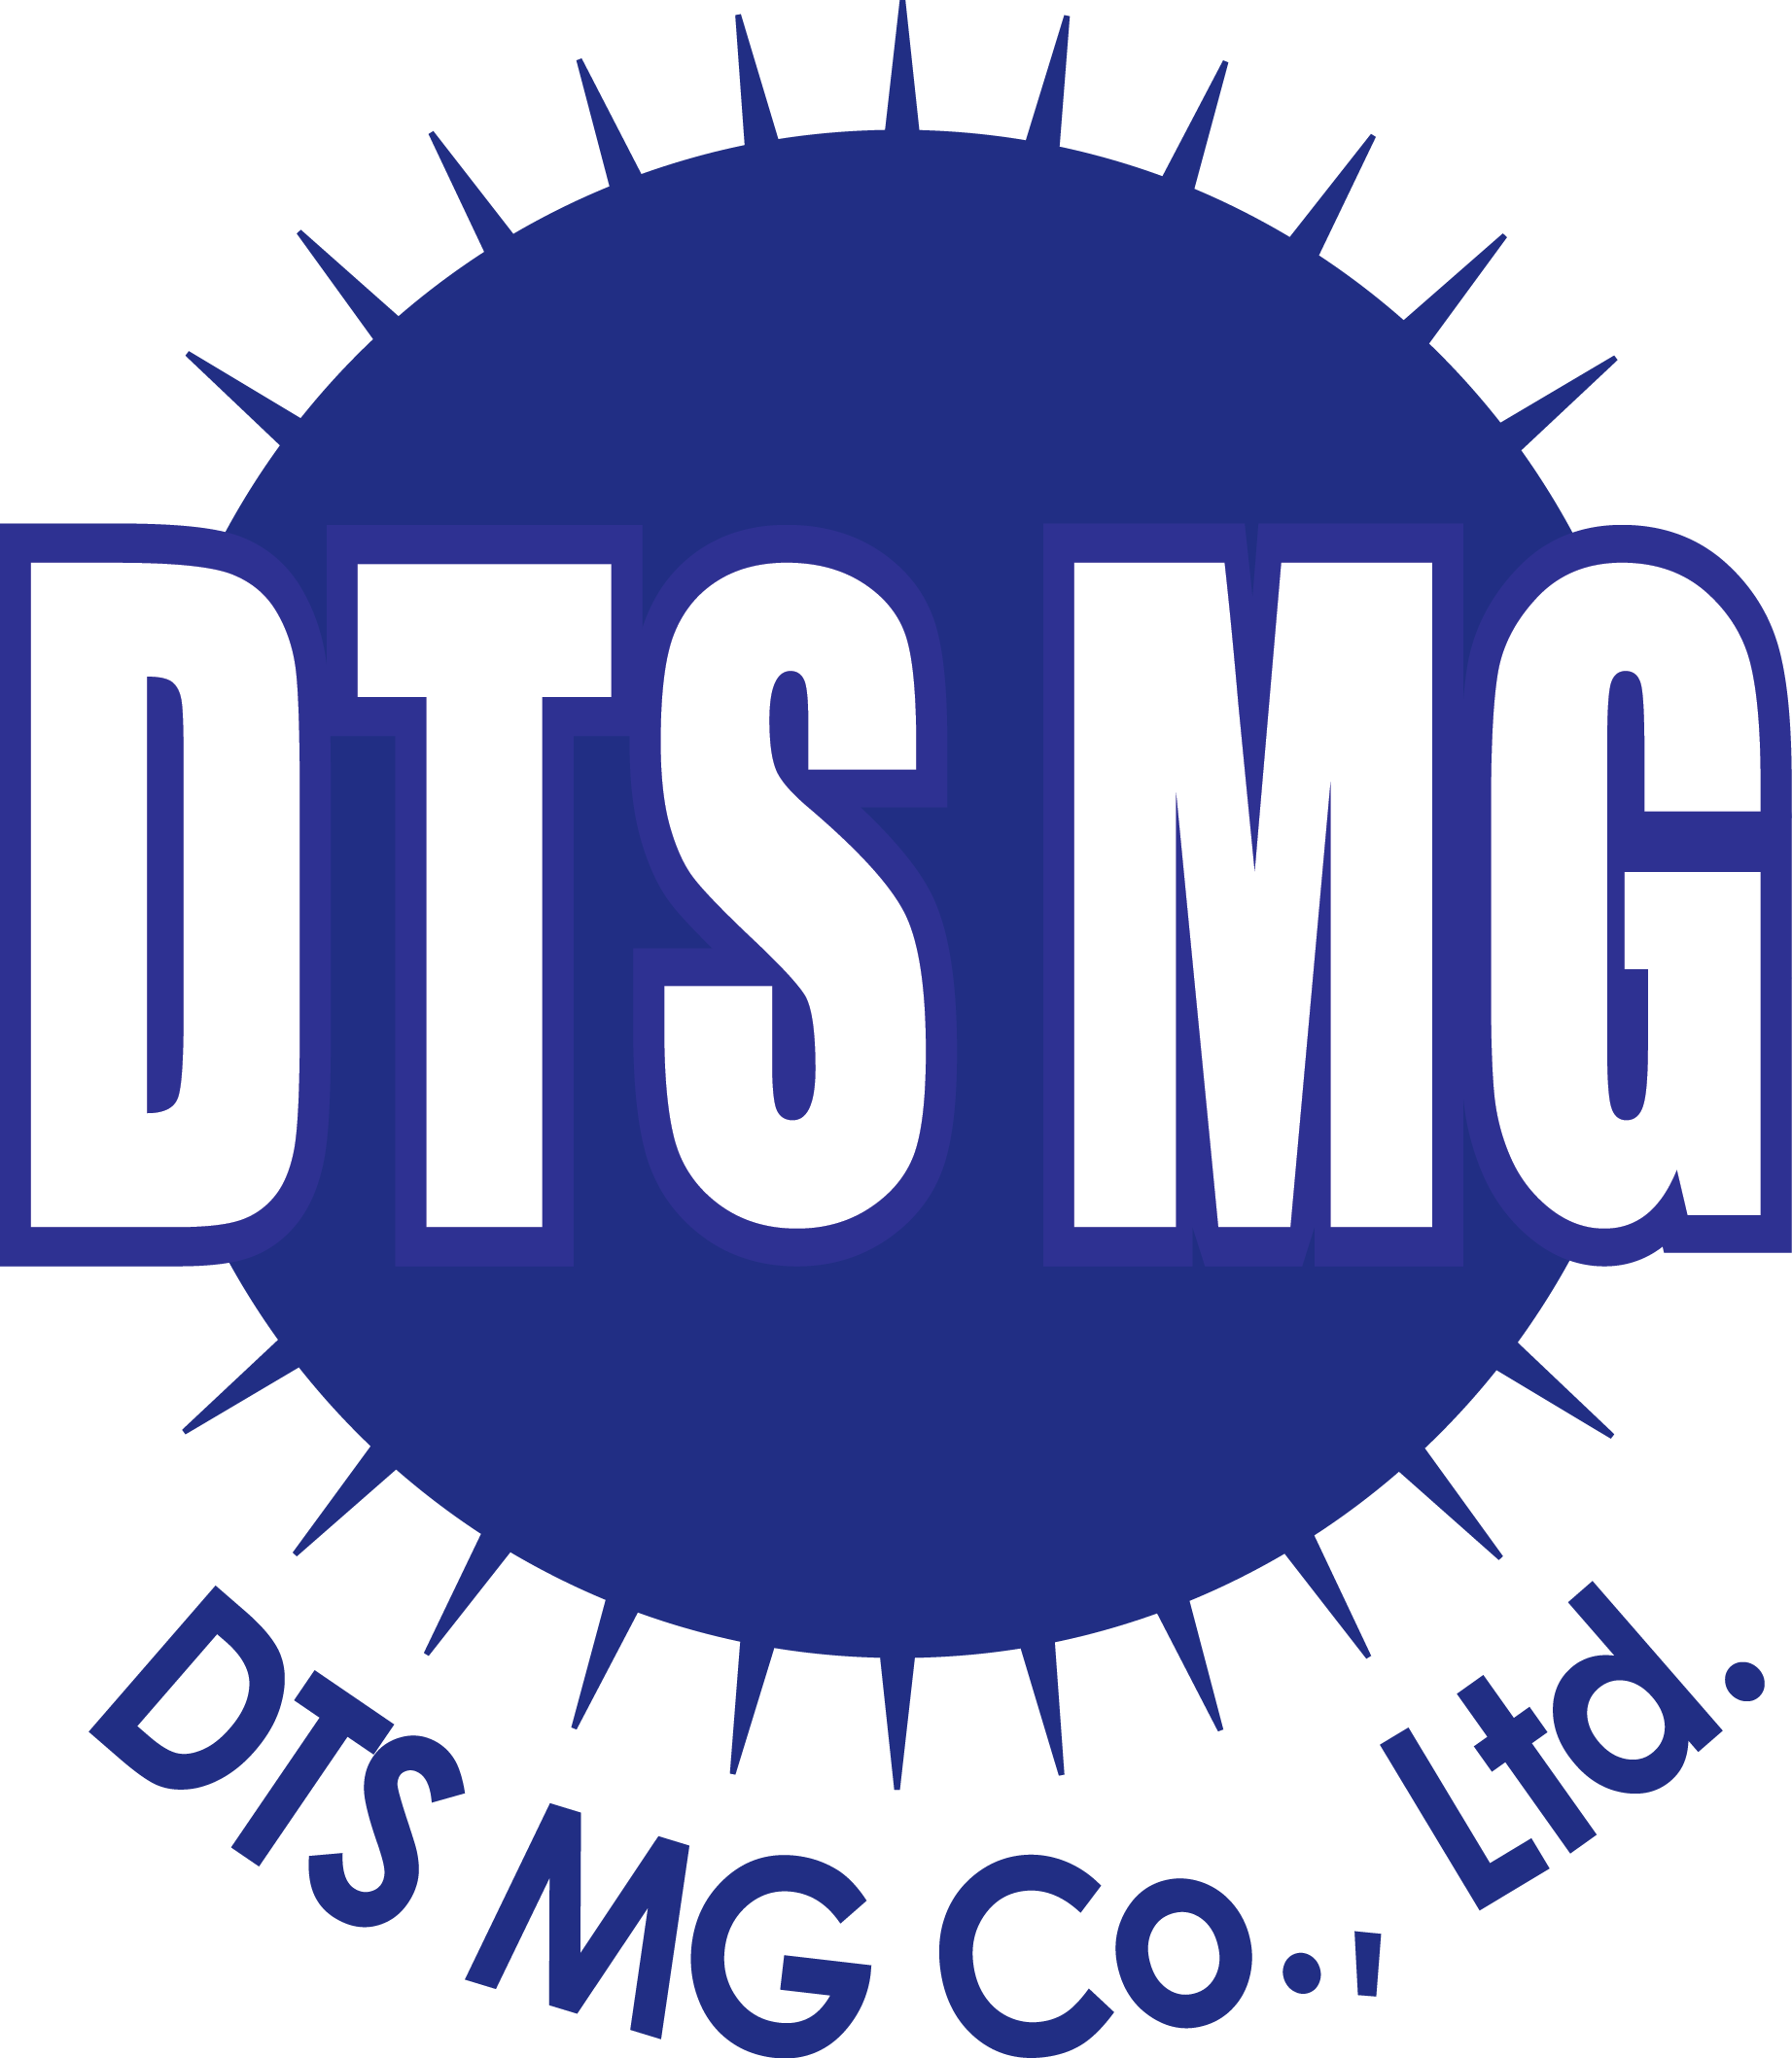 DTS MG Co., Ltd.